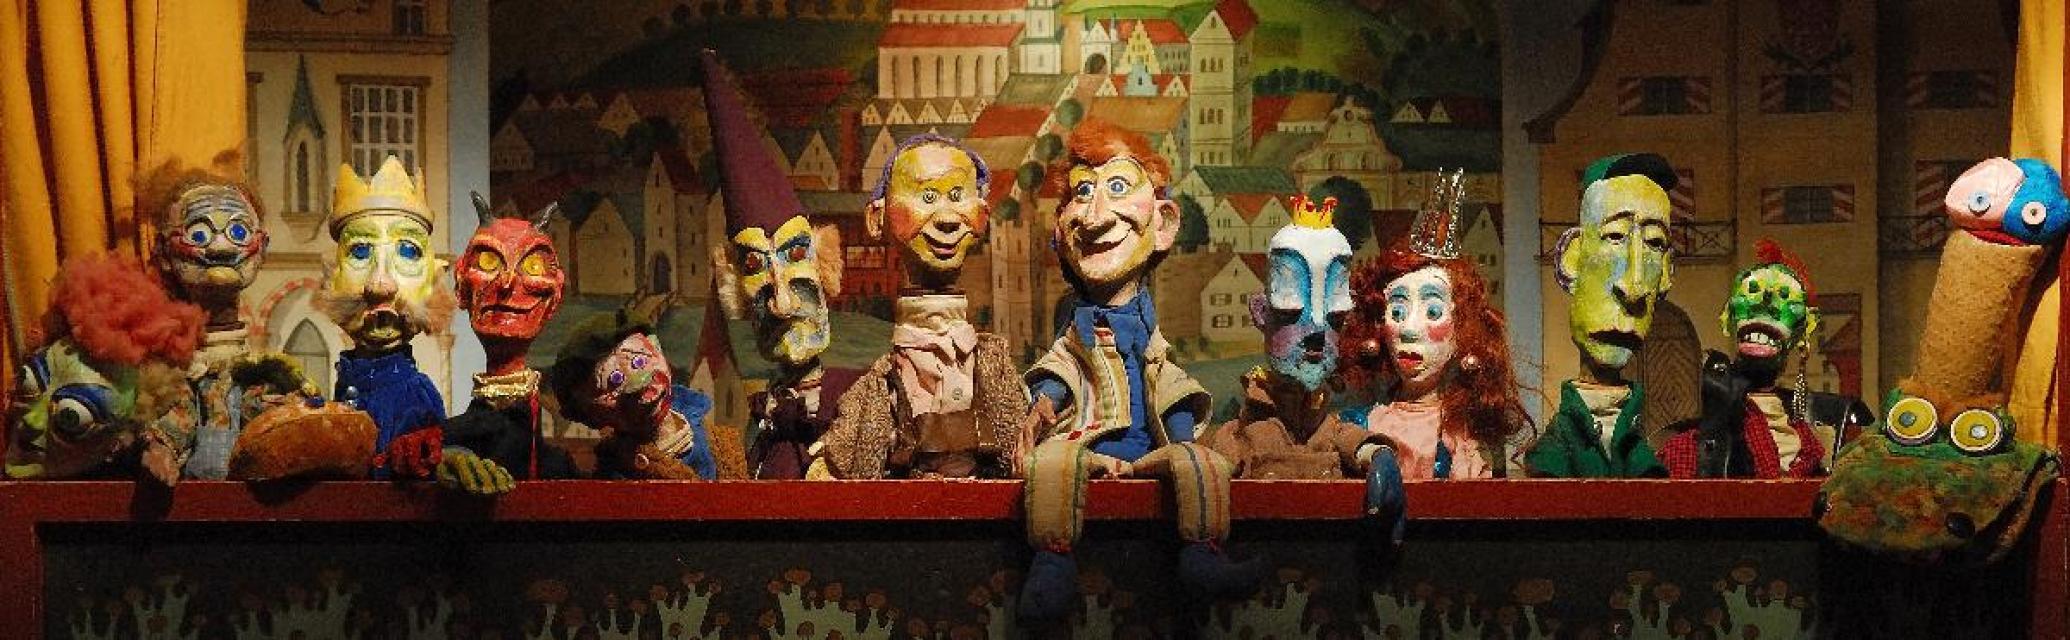 "Dr. Döblingers geschmackvolles Kasperltheater: ""Kasperl und die Brotzeit"""